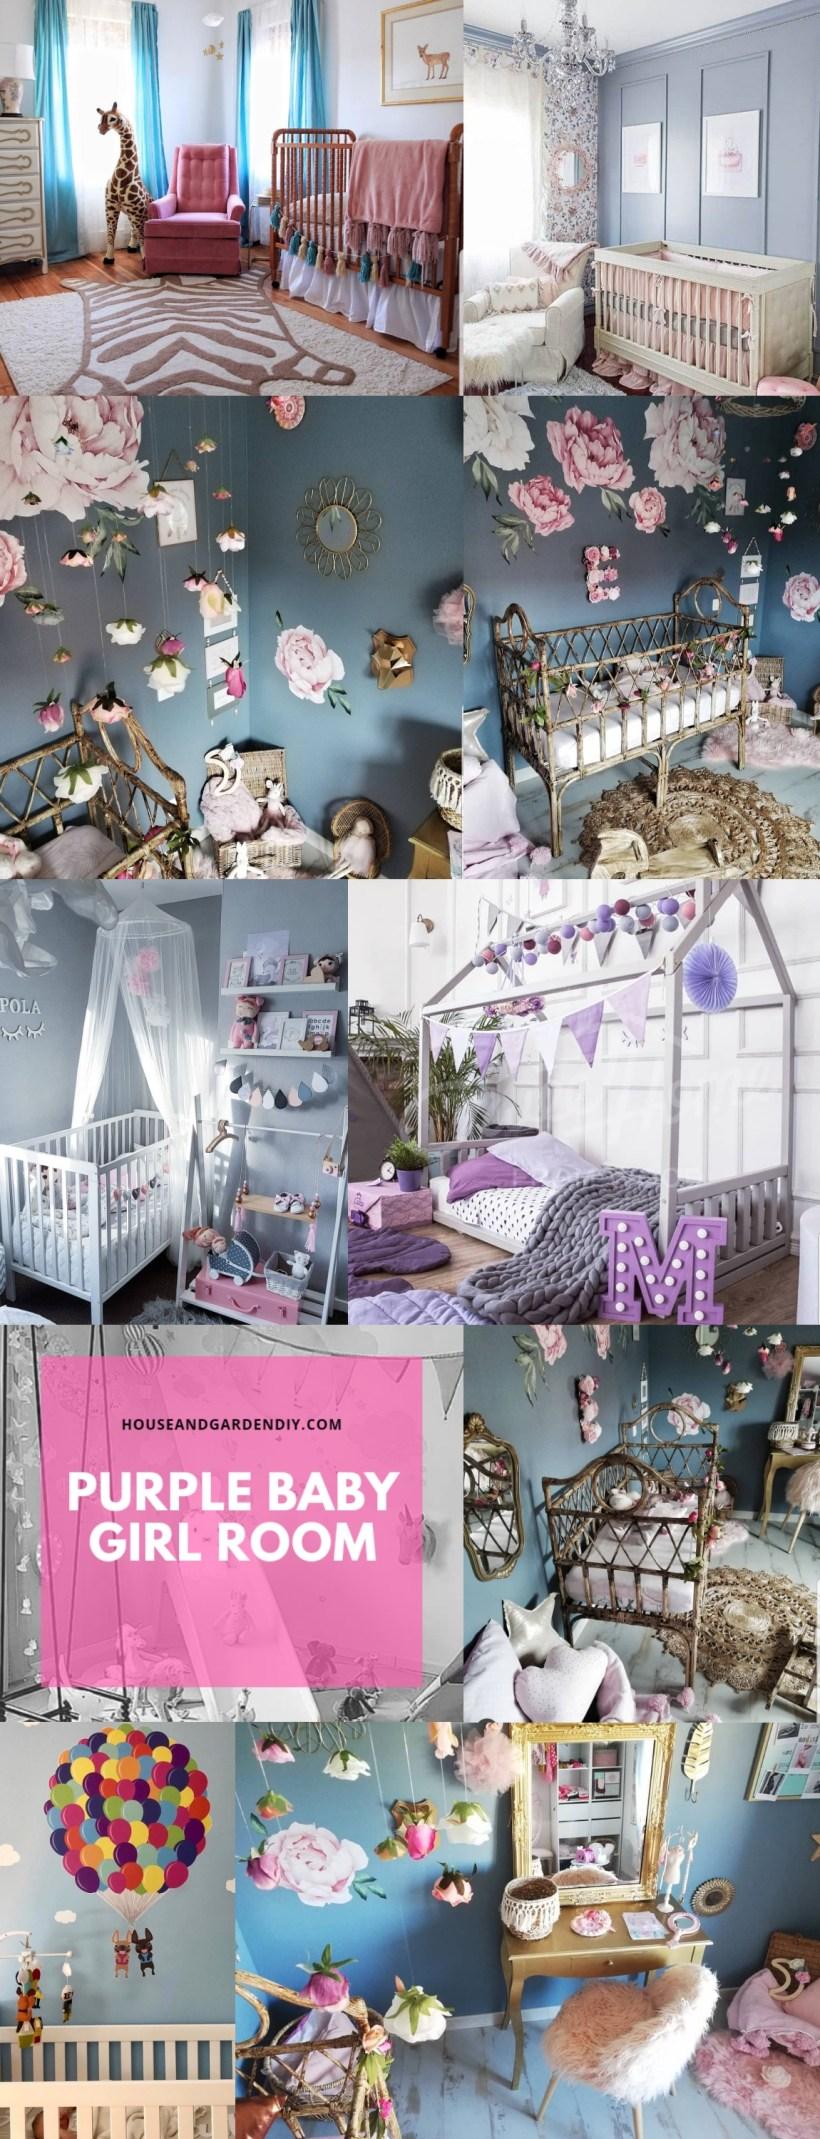 purple baby girl room